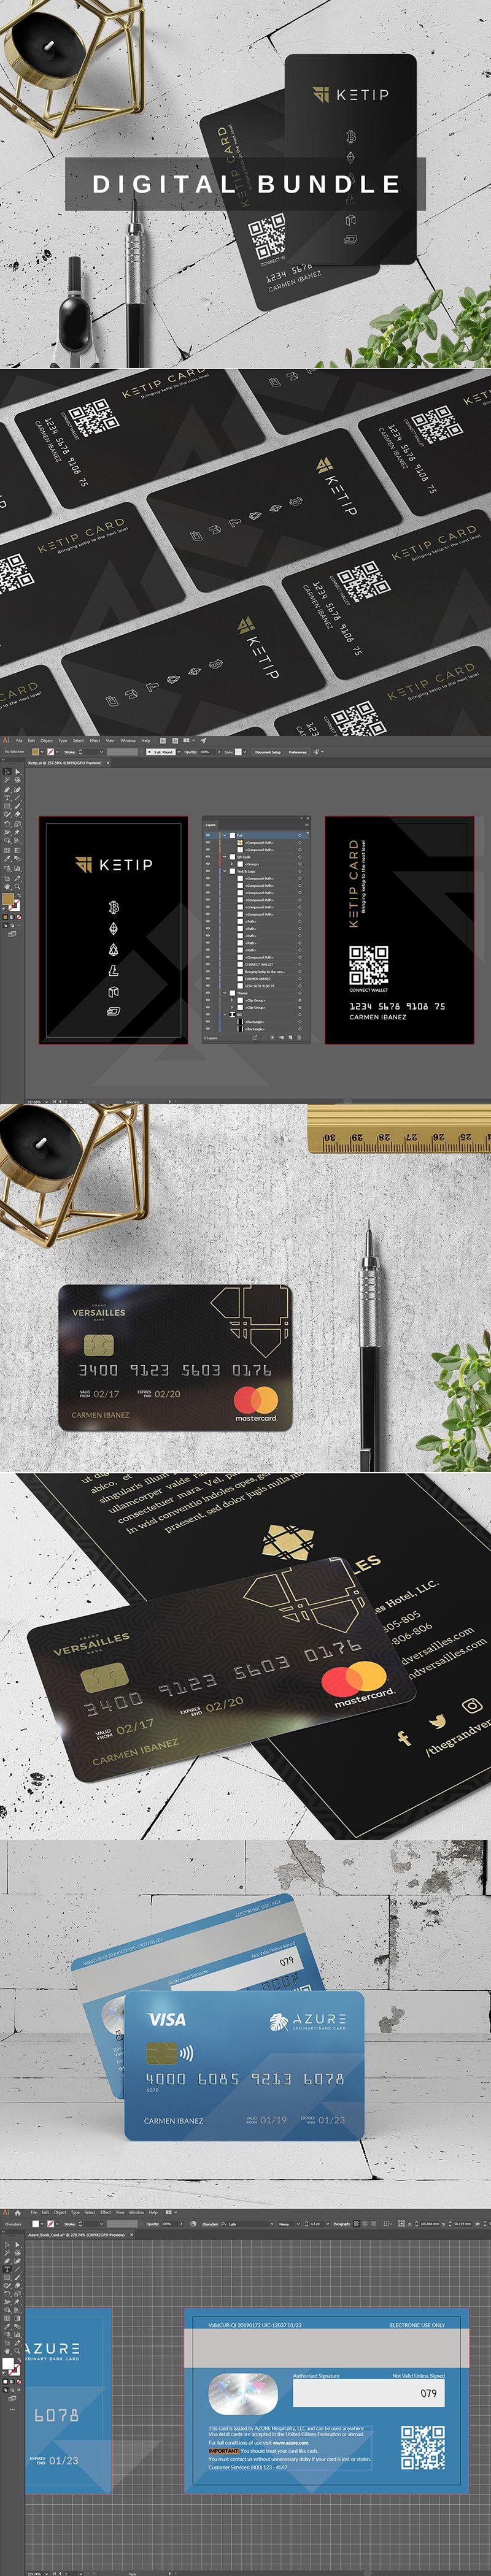 Save 20 Three Modern Sleek Templates Of Bank Card In One Stunning Bundle